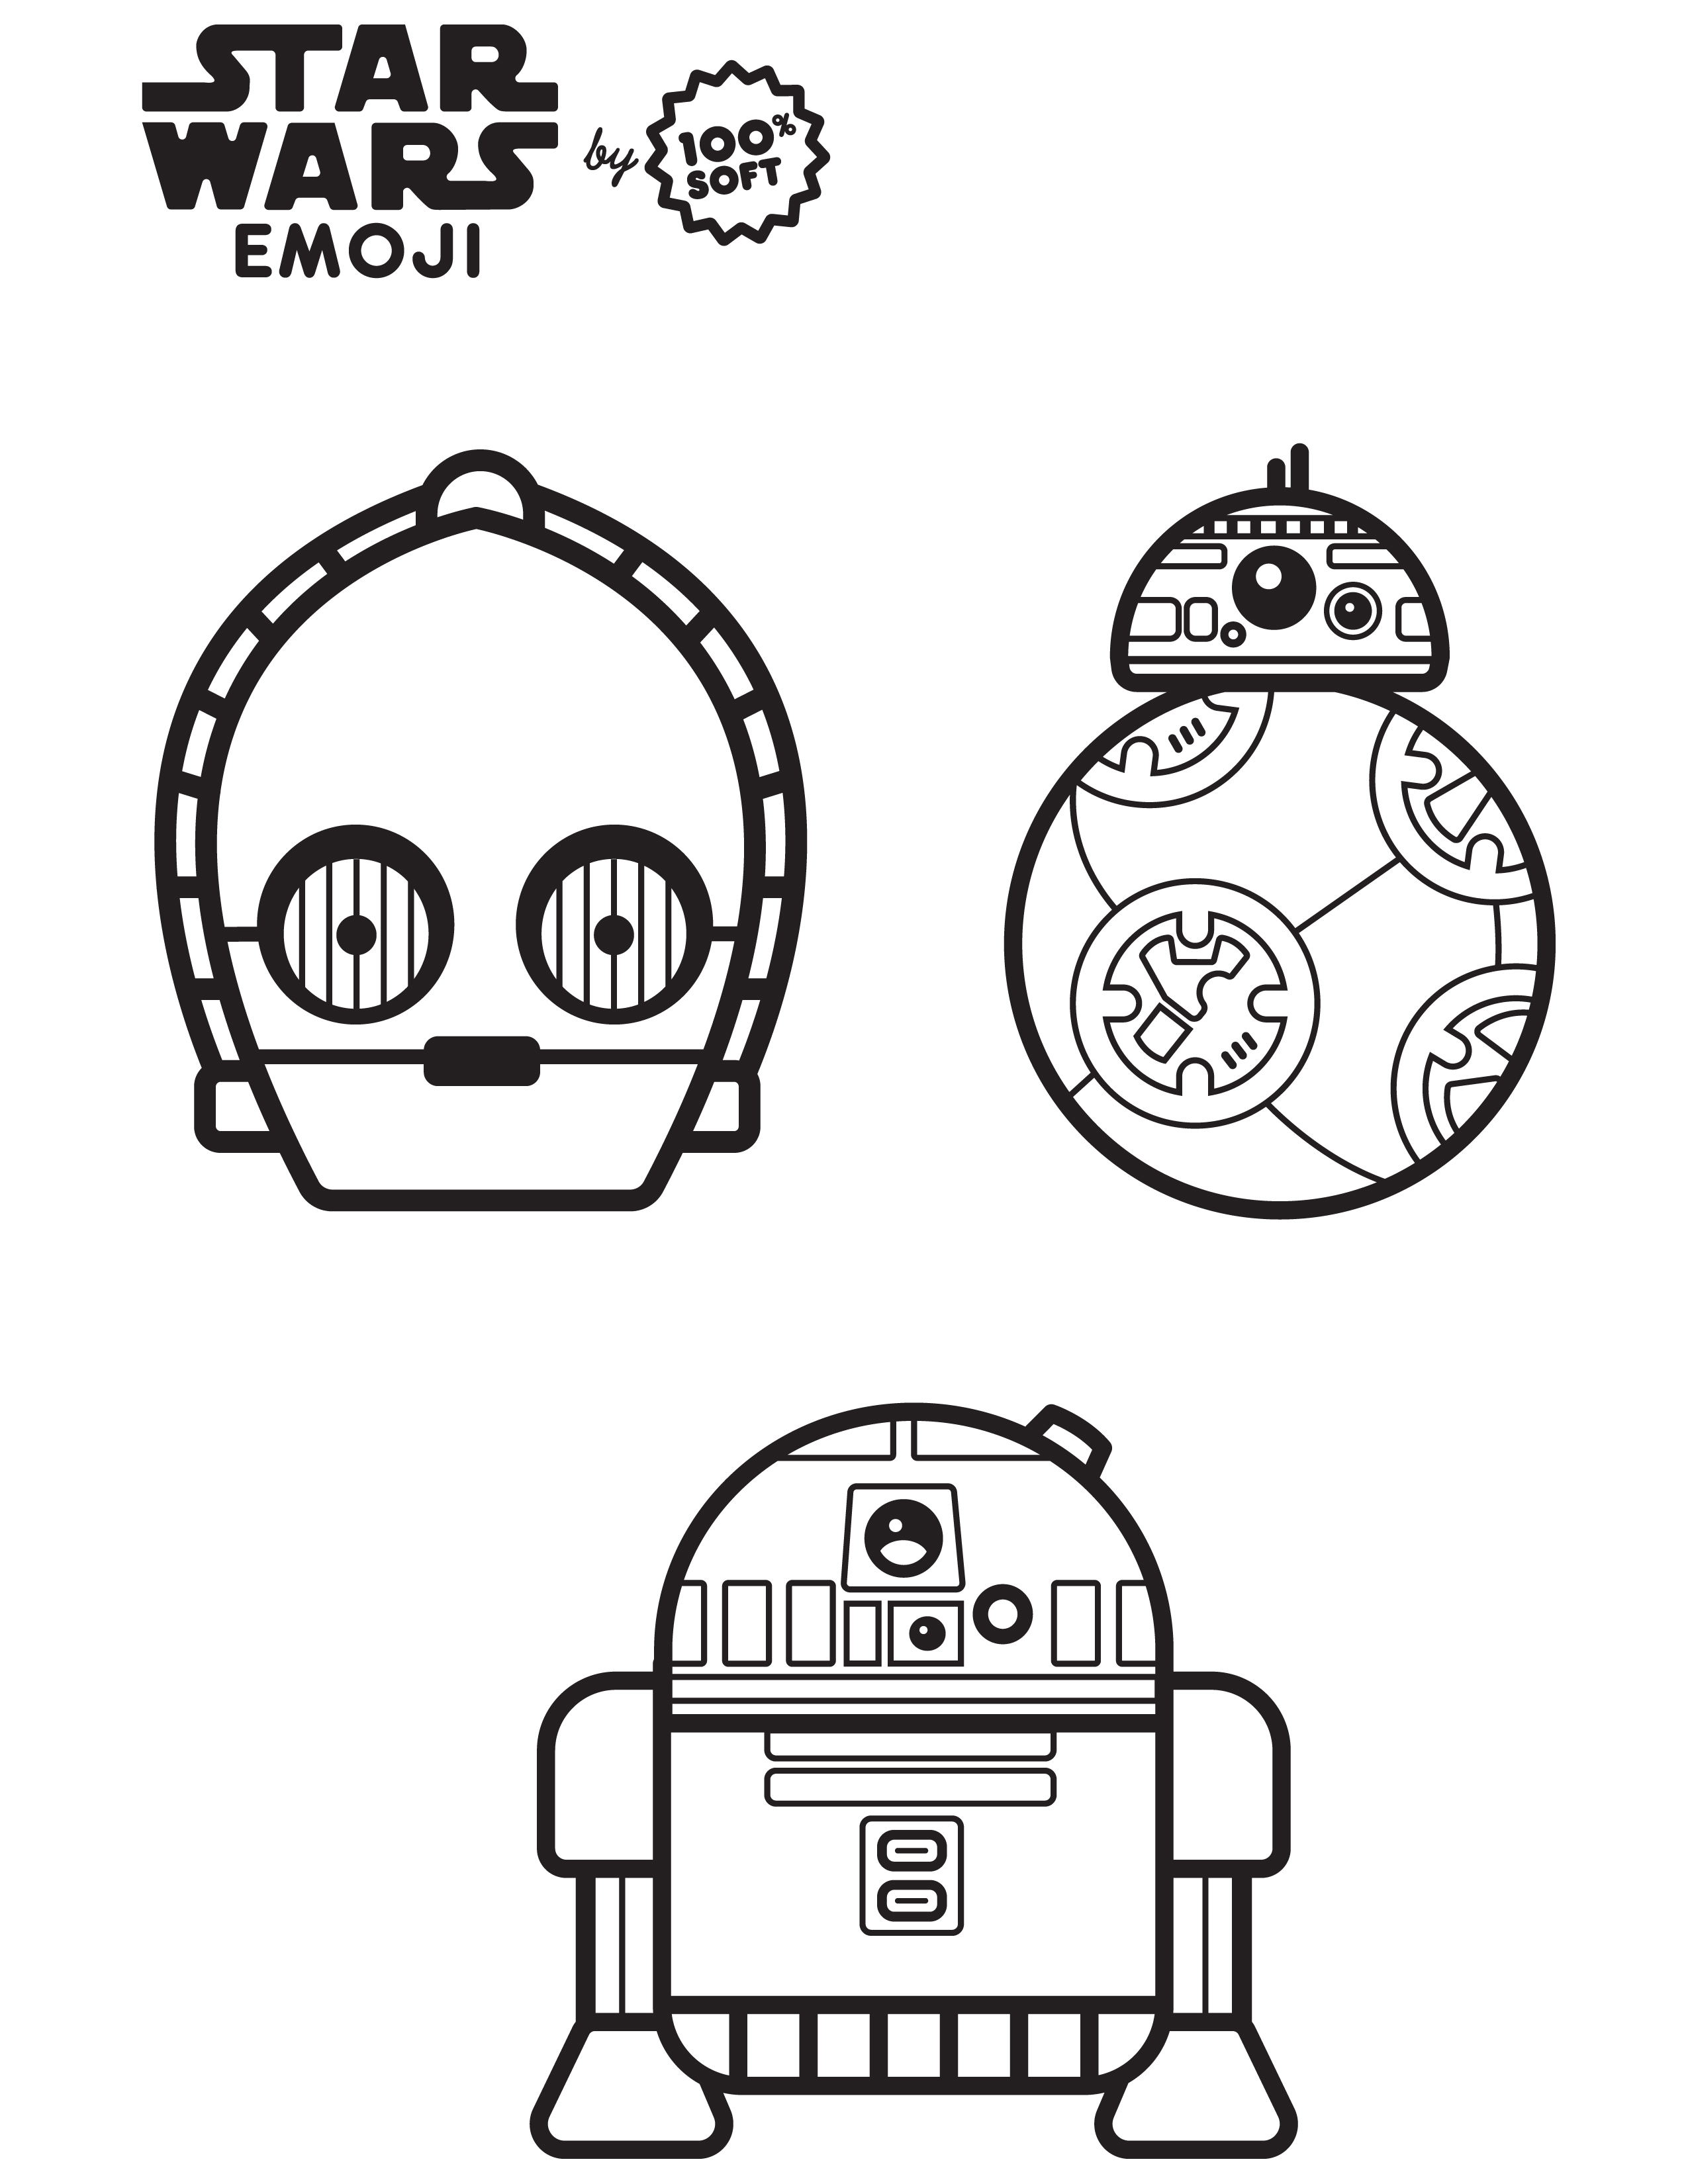 Star Wars Emoji Coloring Page The Dig